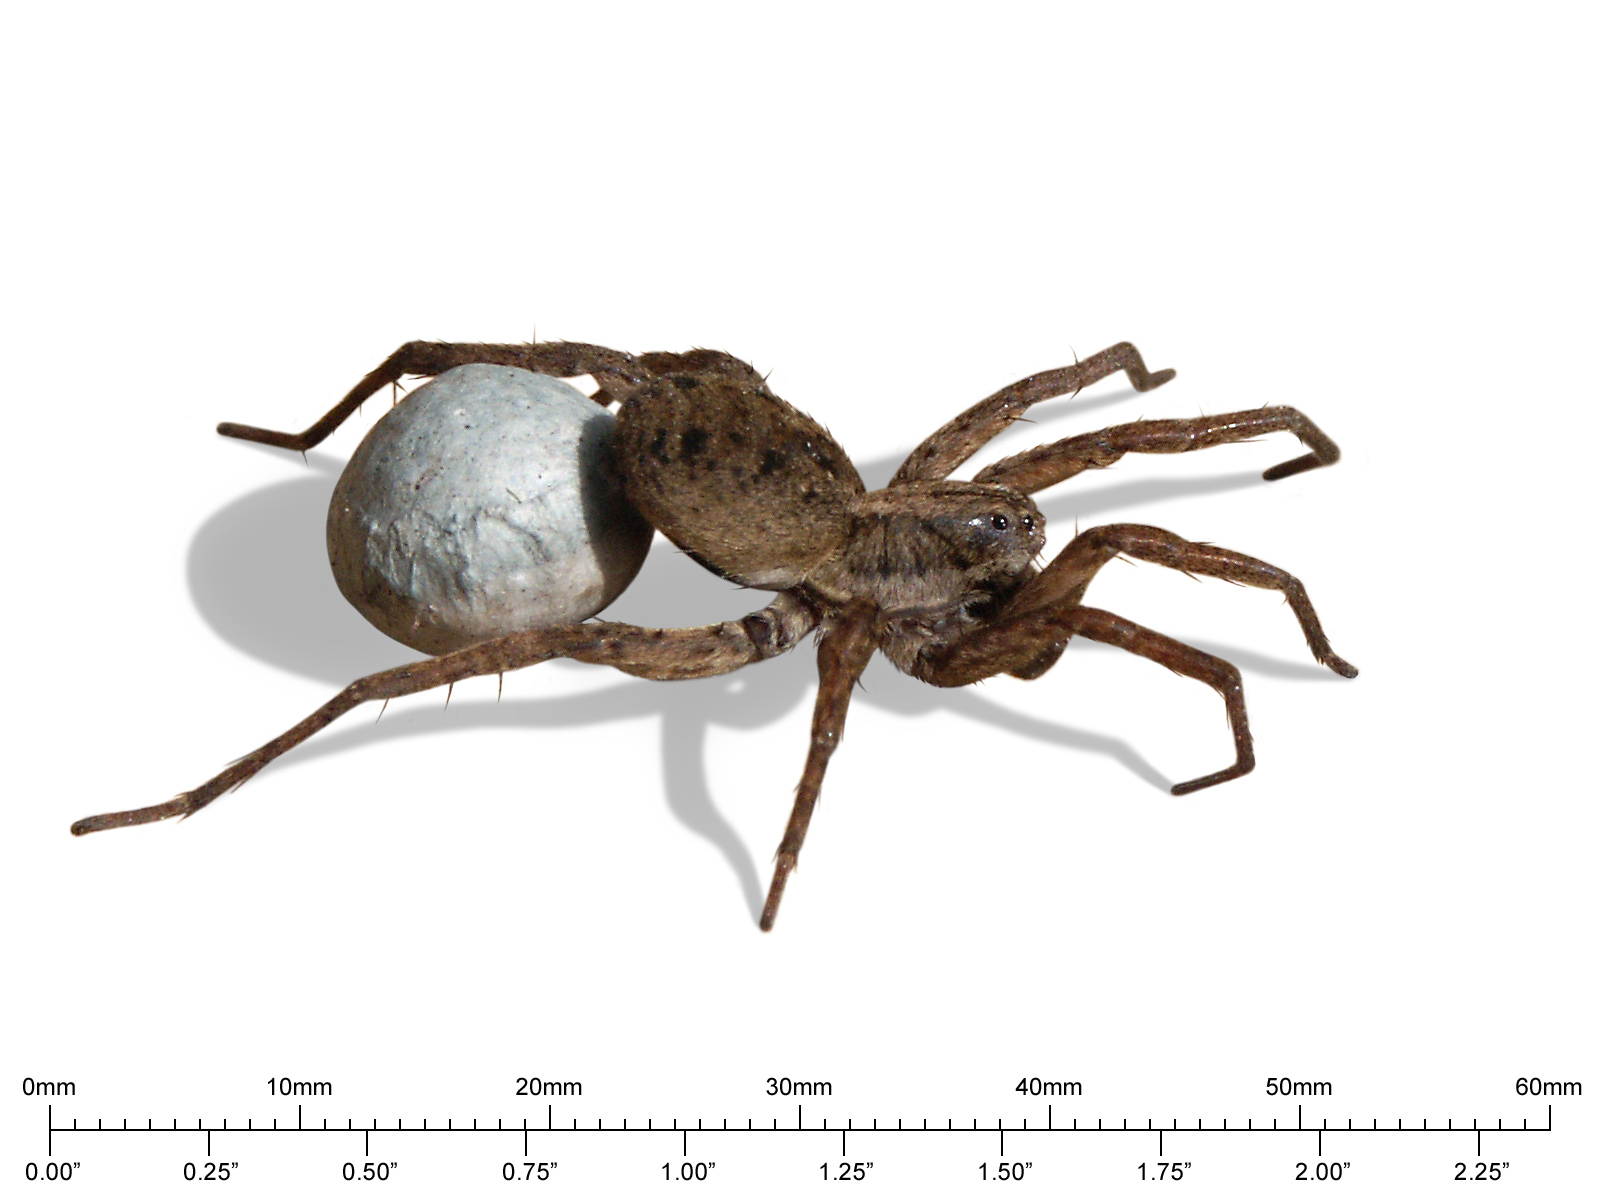 hobo spider size